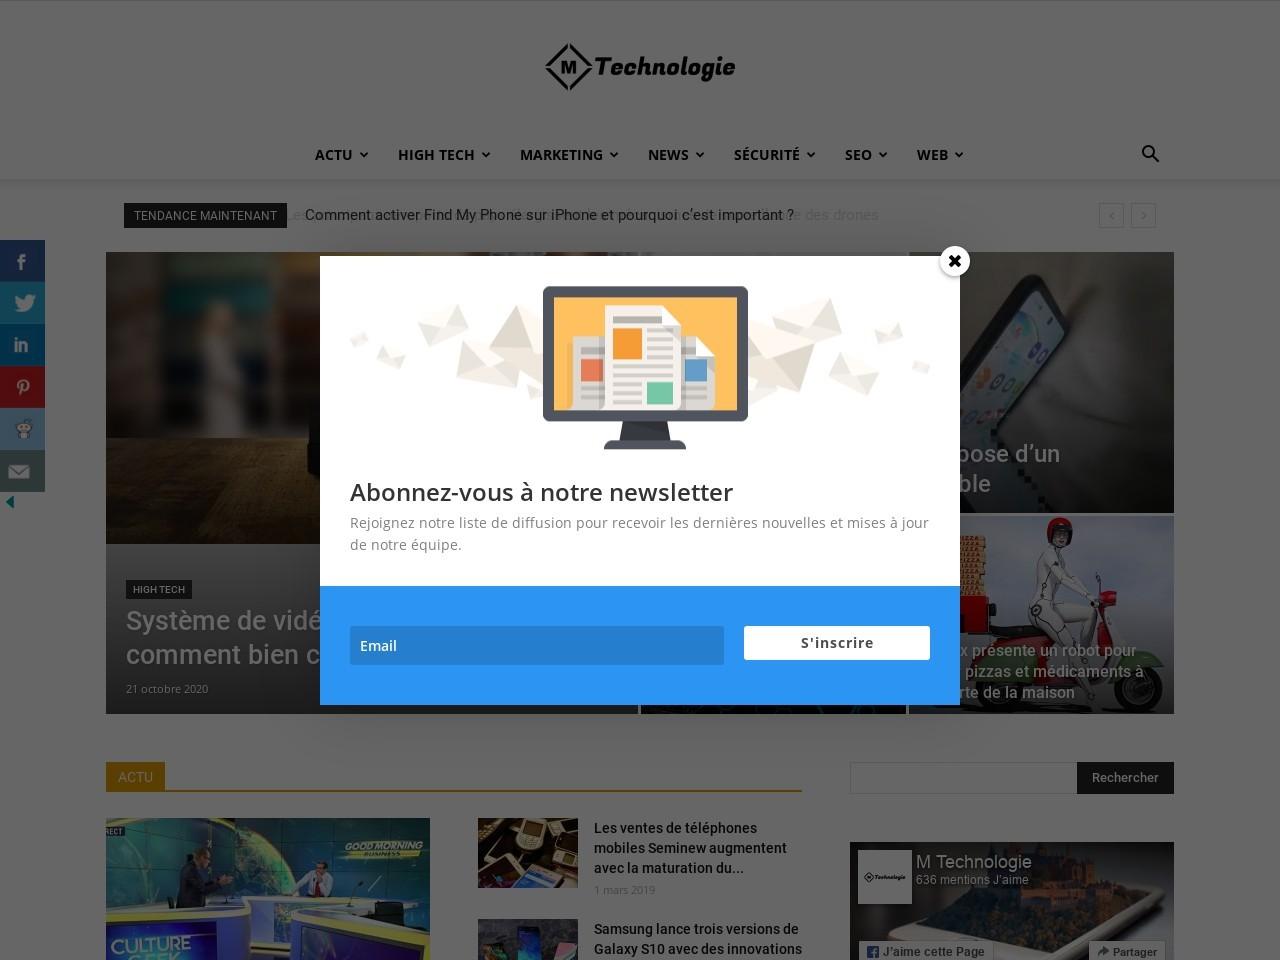 mtechnologie.fr